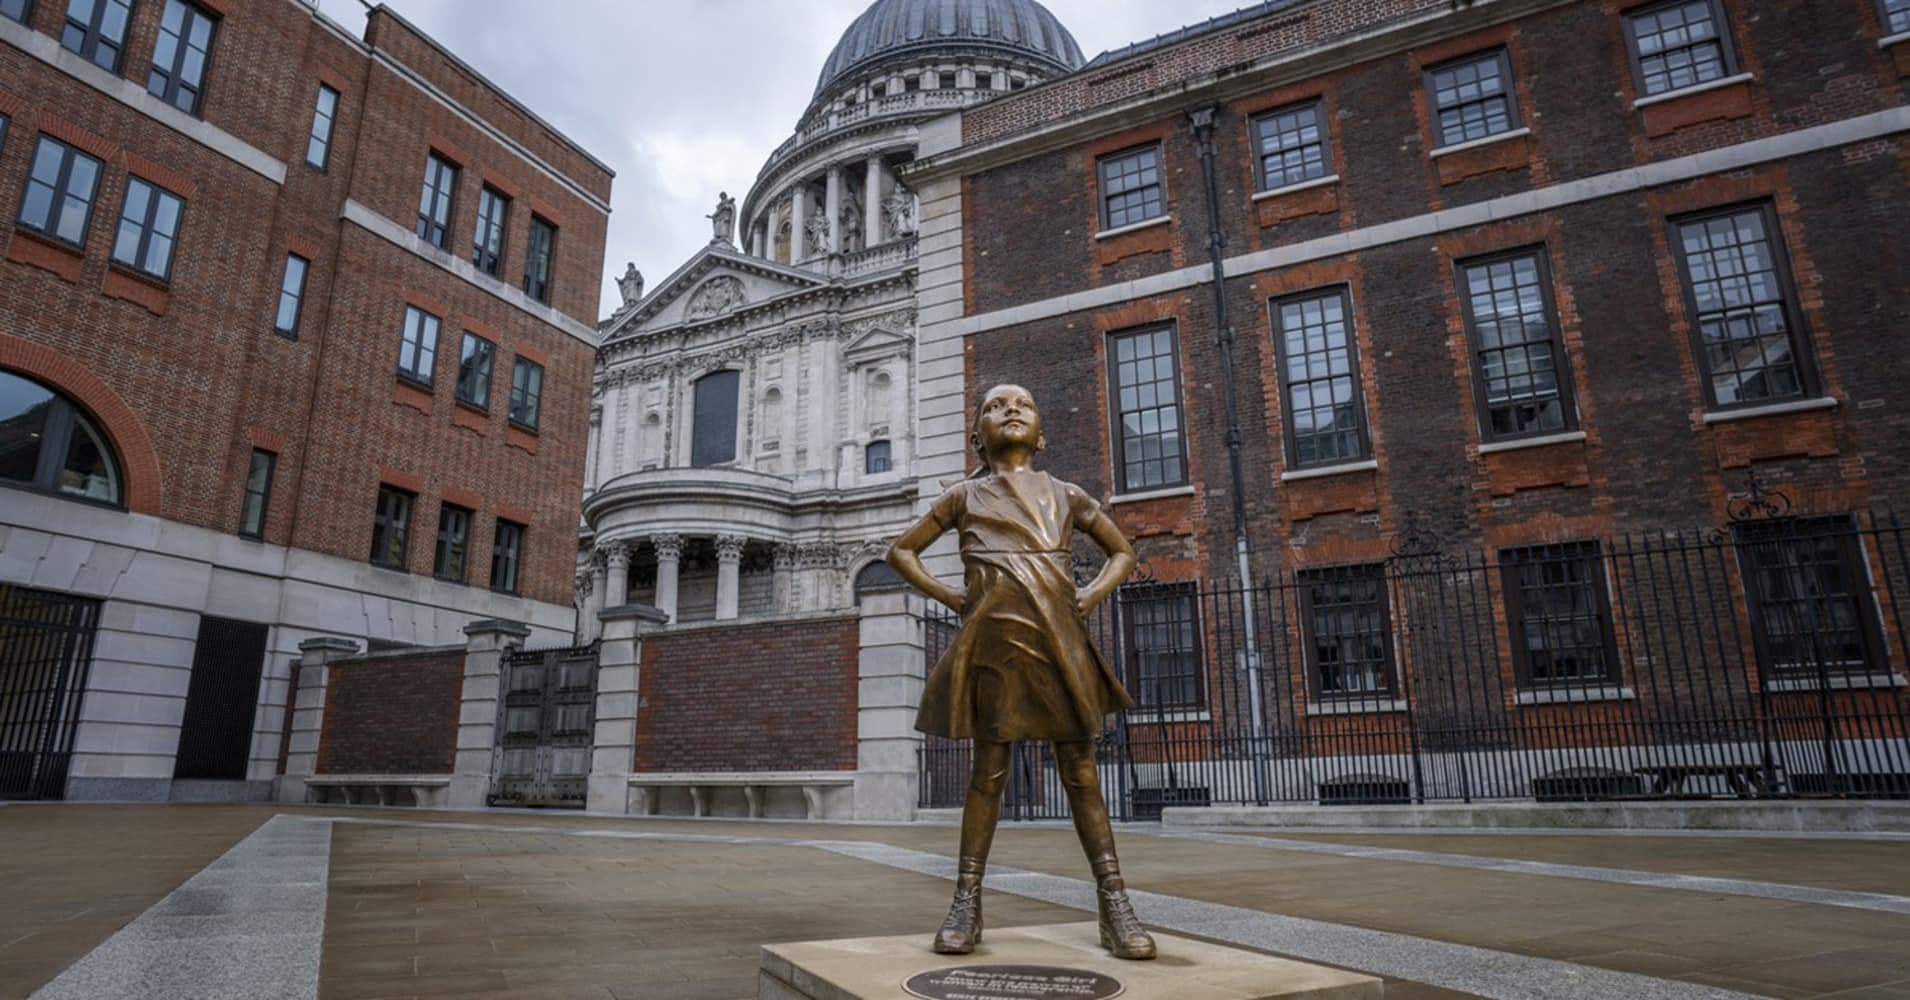 Fearless Girl statue in London. Sculpture by Kristen Visbal.